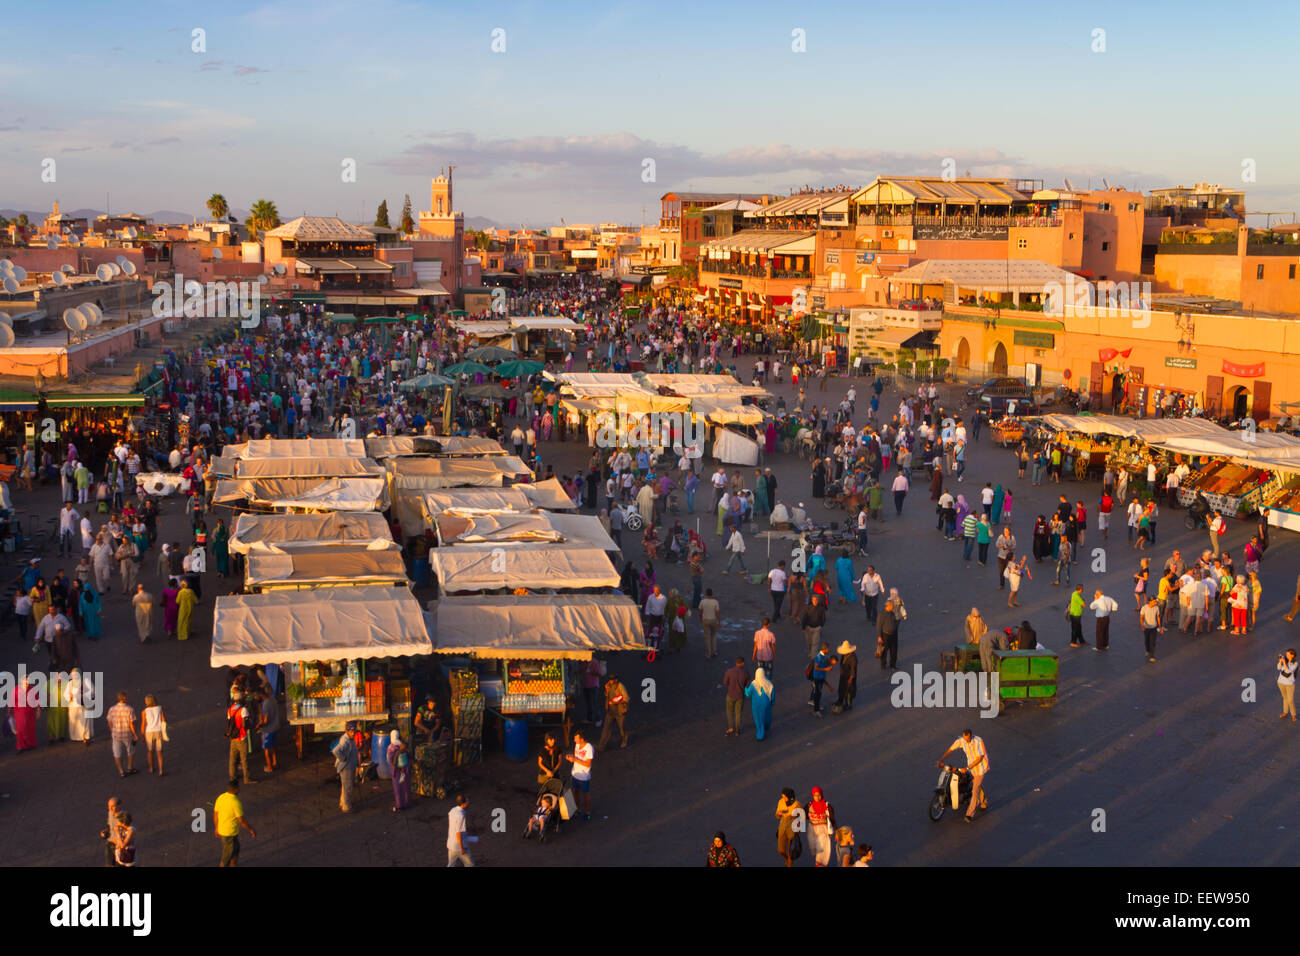 Jamaa el Fna, Marrakesh, Morocco. - Stock Photo